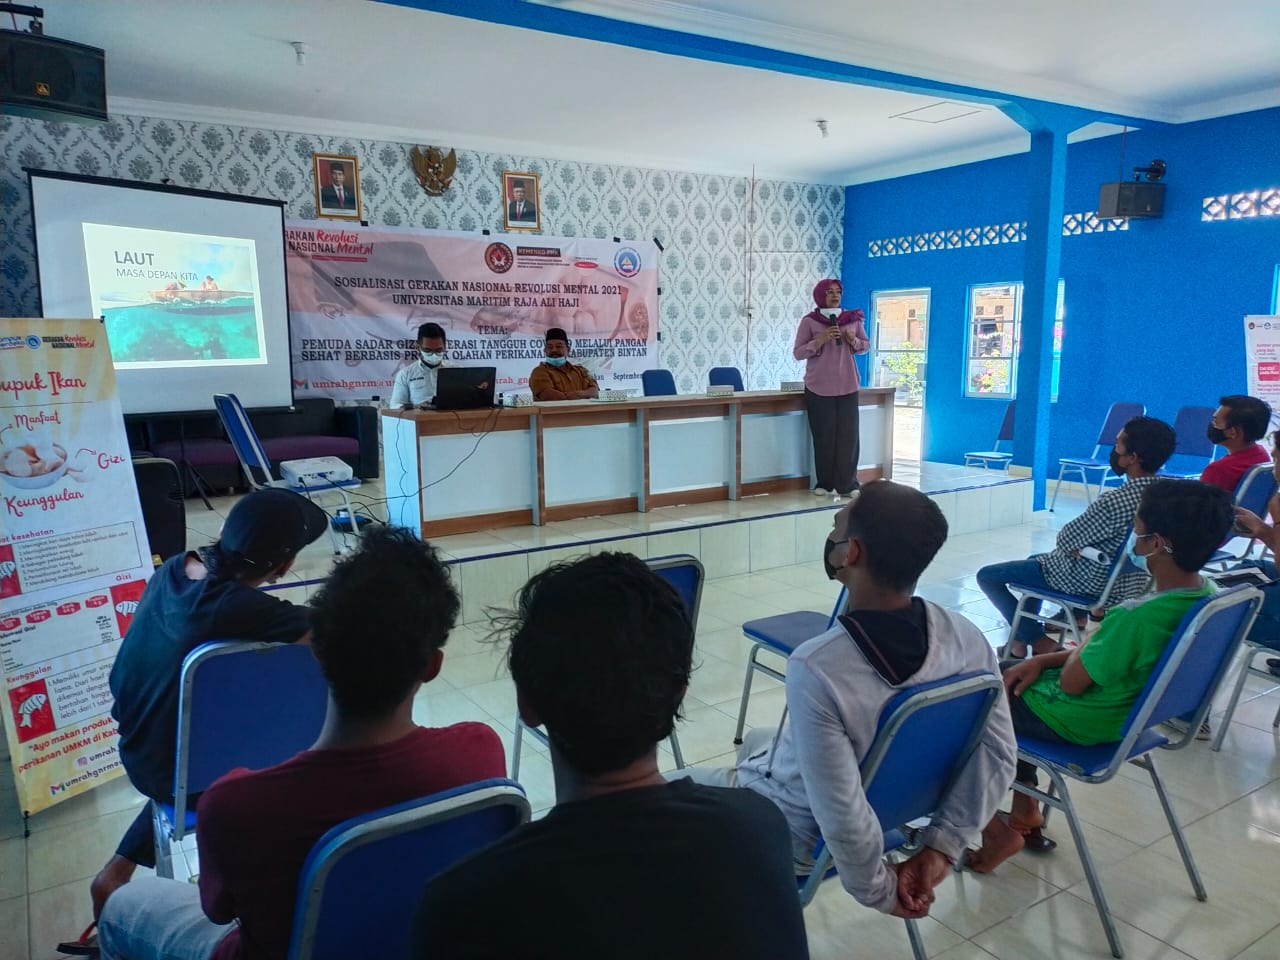 Narasumber Kegiatan GNRM UMRAH, Dr. Ir. T Ersti Yulika Sari, S.Pi M.Si Yang Juga Merupakan Dekan Fakultas Ilmu Kelautan dan Perikanan UMRAH.